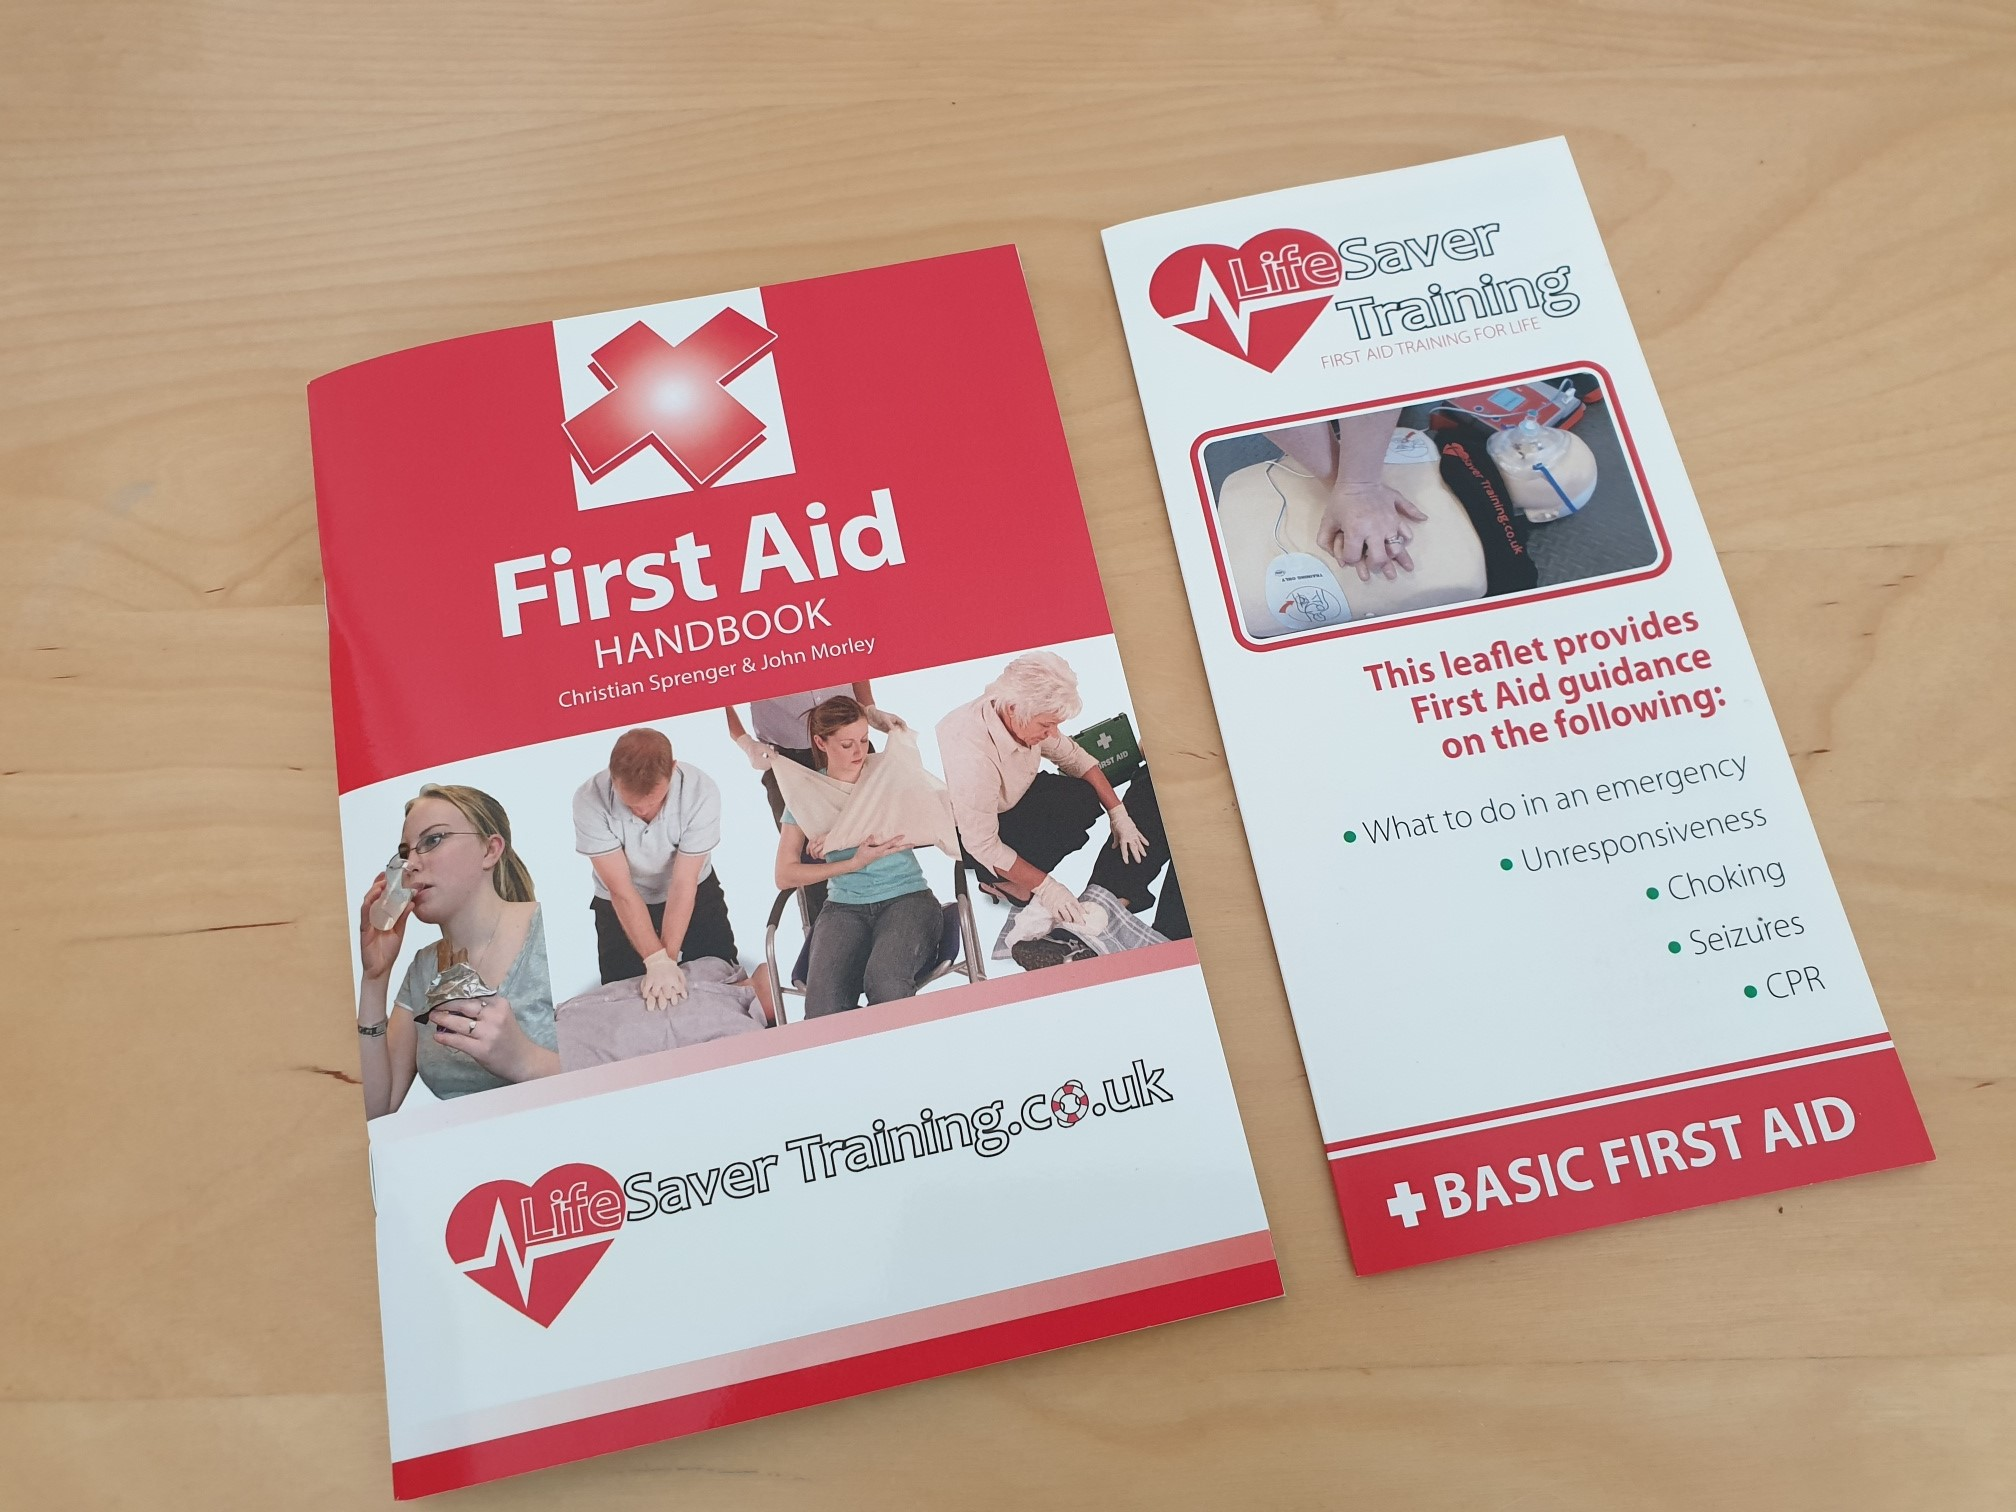 Lifesaver first aid manual / leaflet